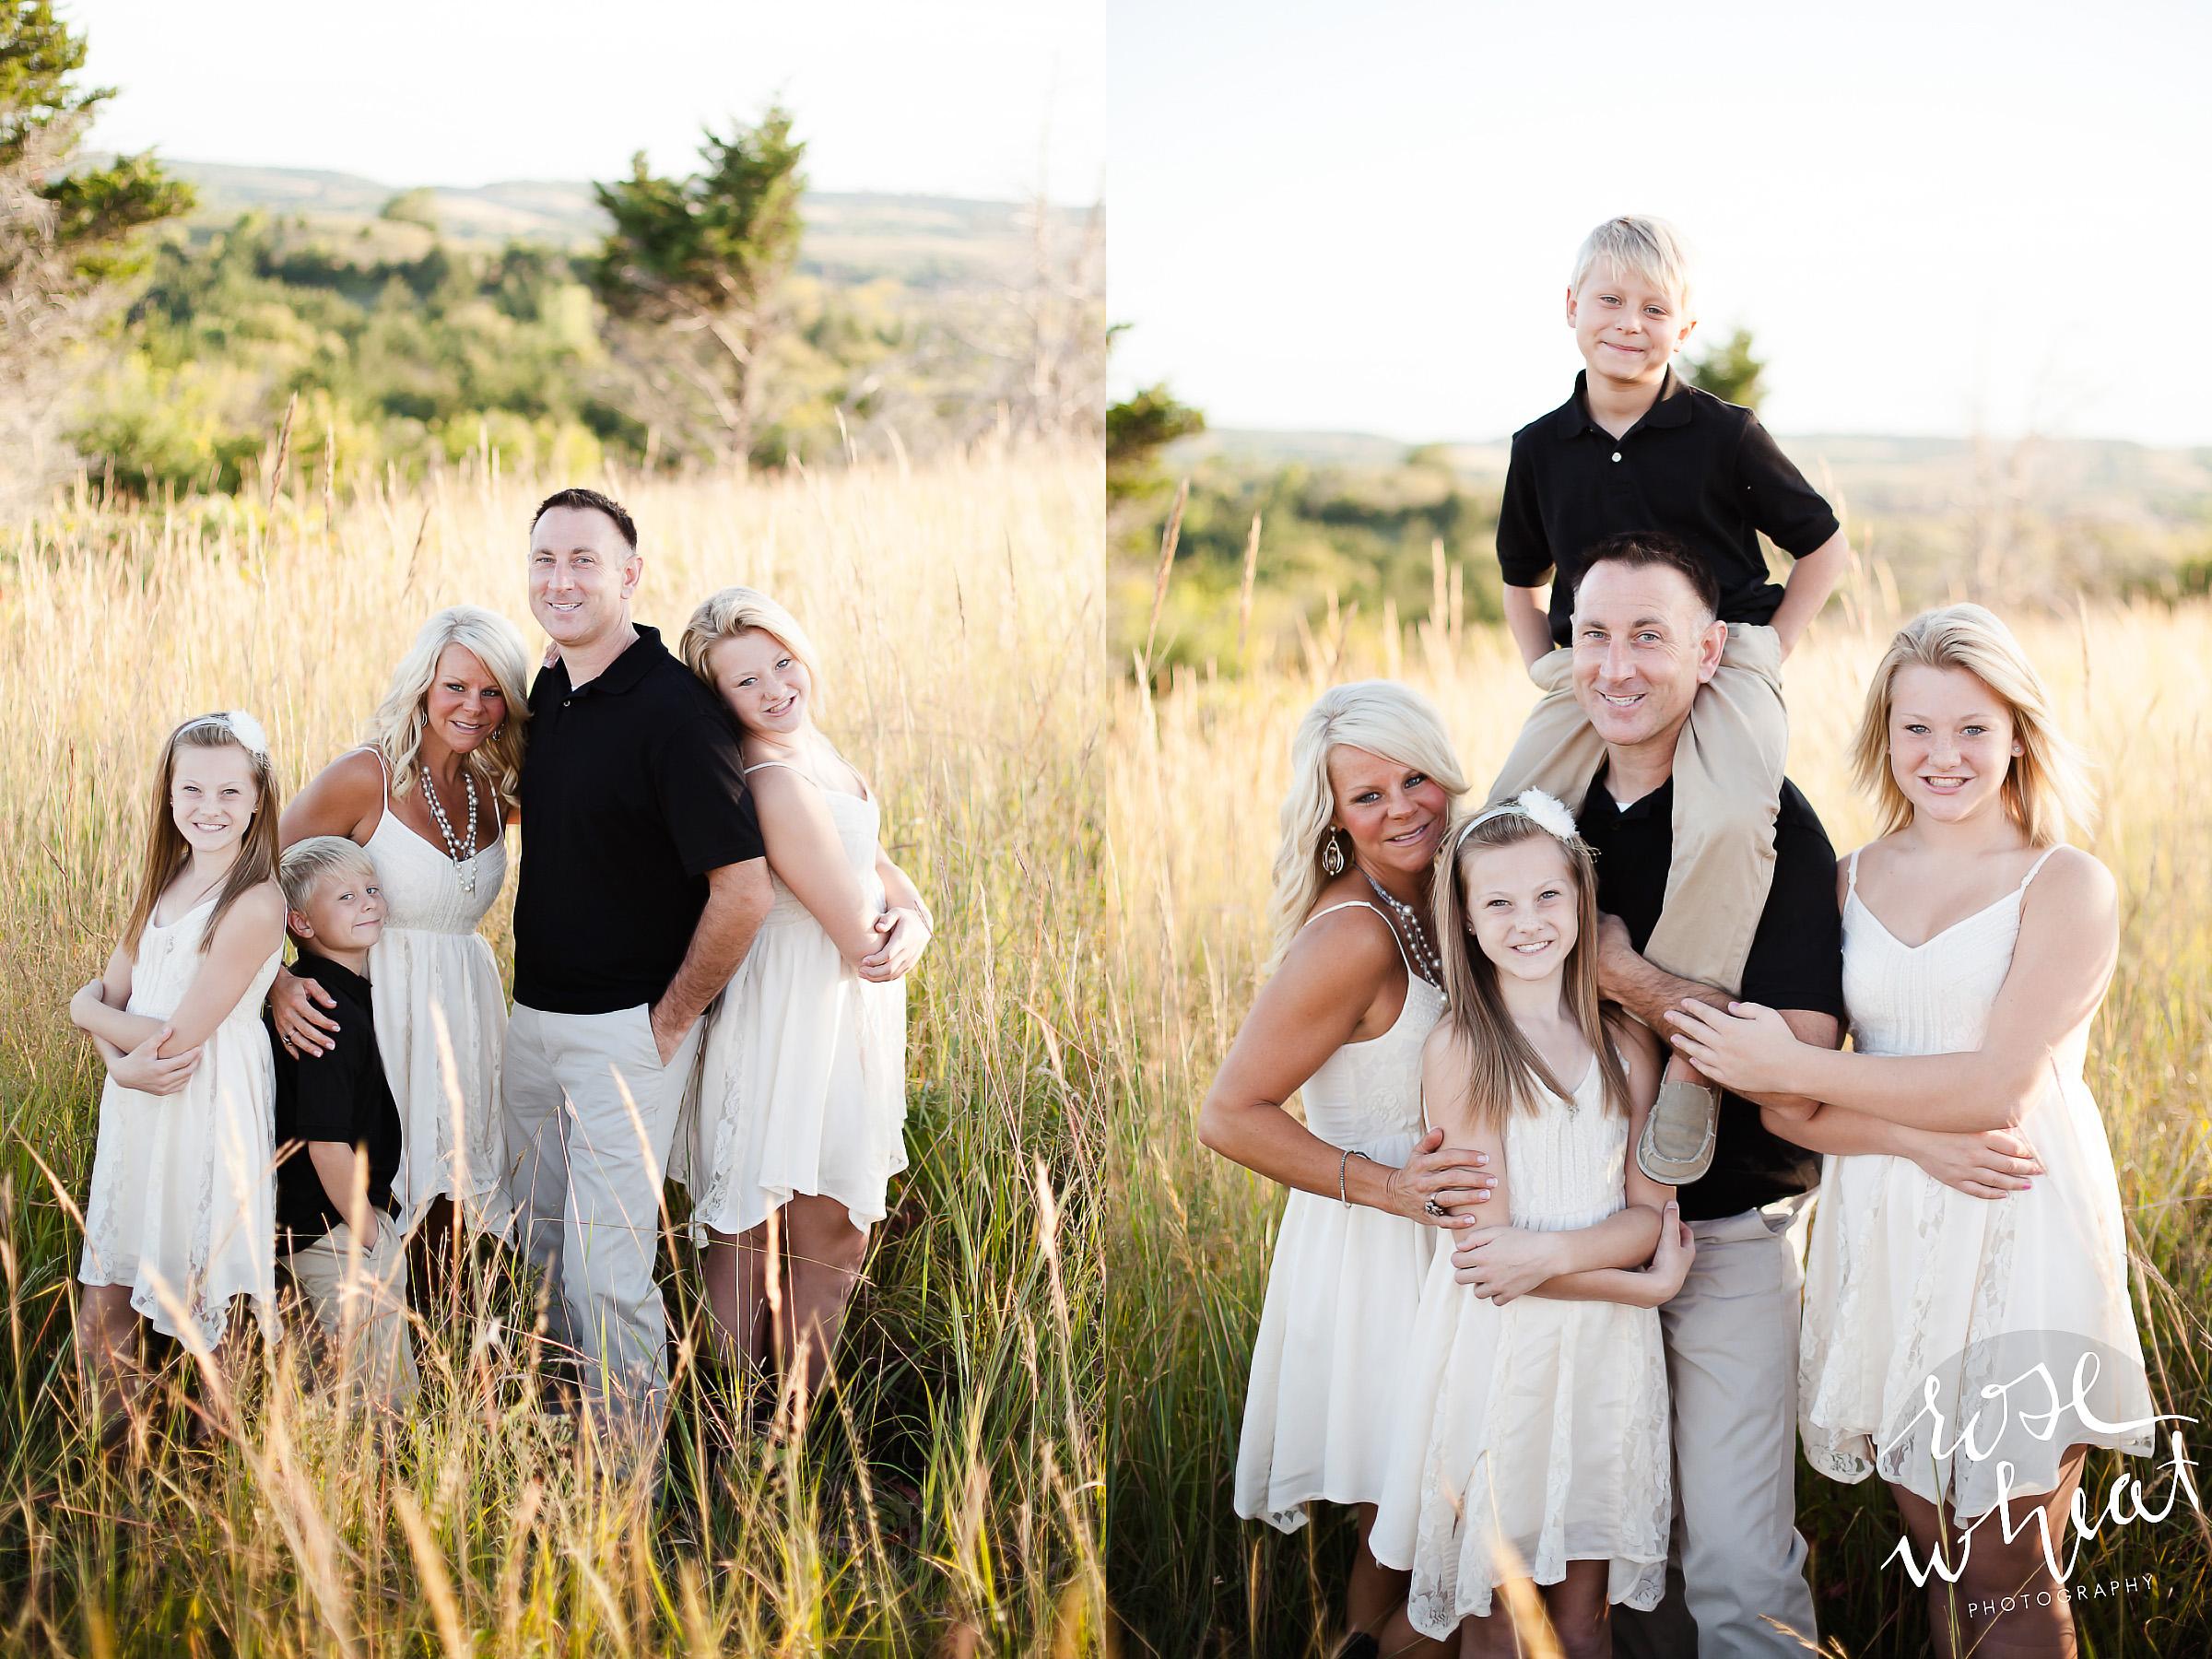 14. G_Family_Photos_Rose_Wheat_Photography.jpg